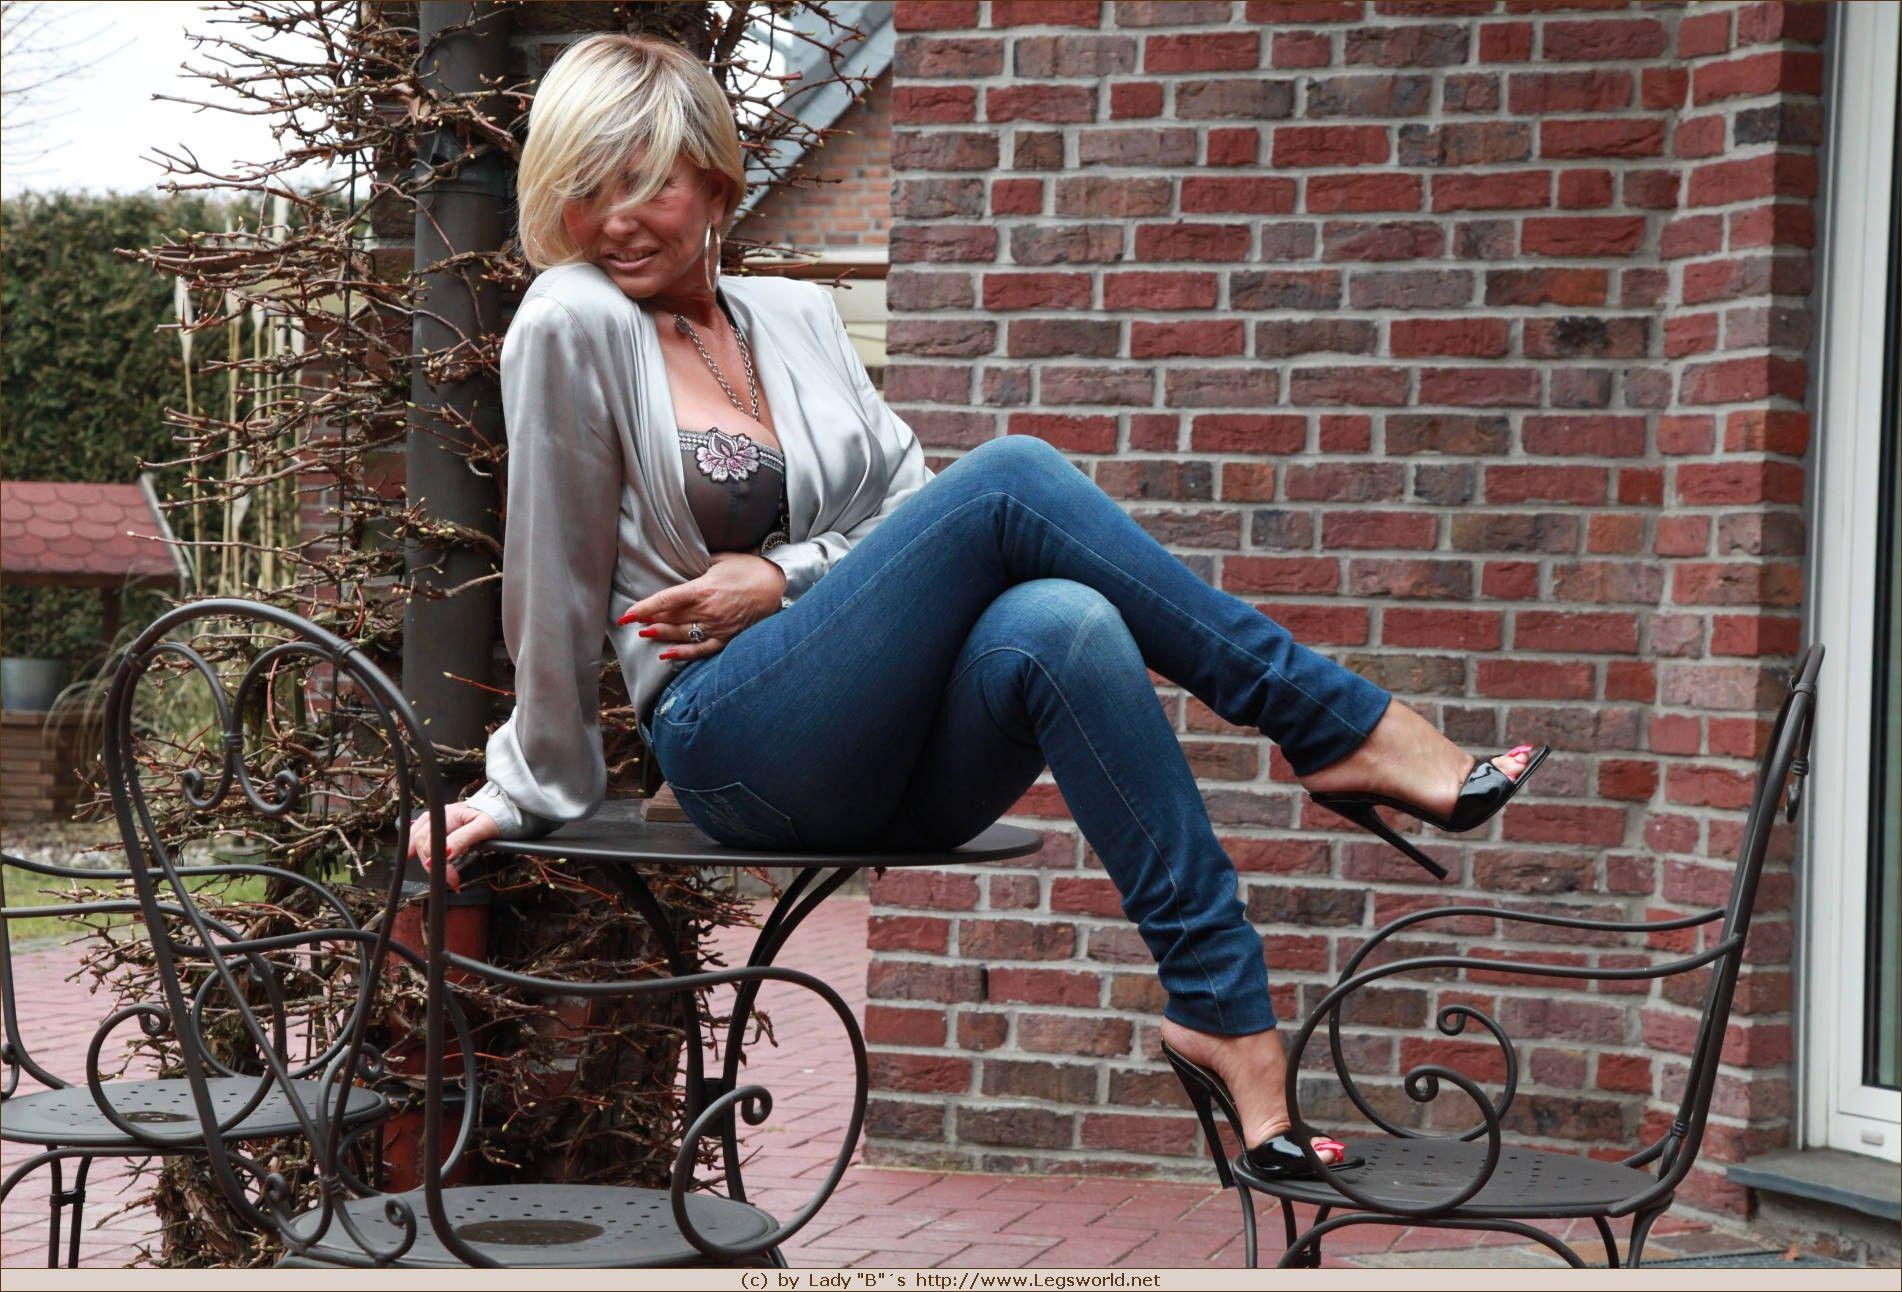 Pin Von Andi Auf Lady Barbara Stiletto Shoes Tights